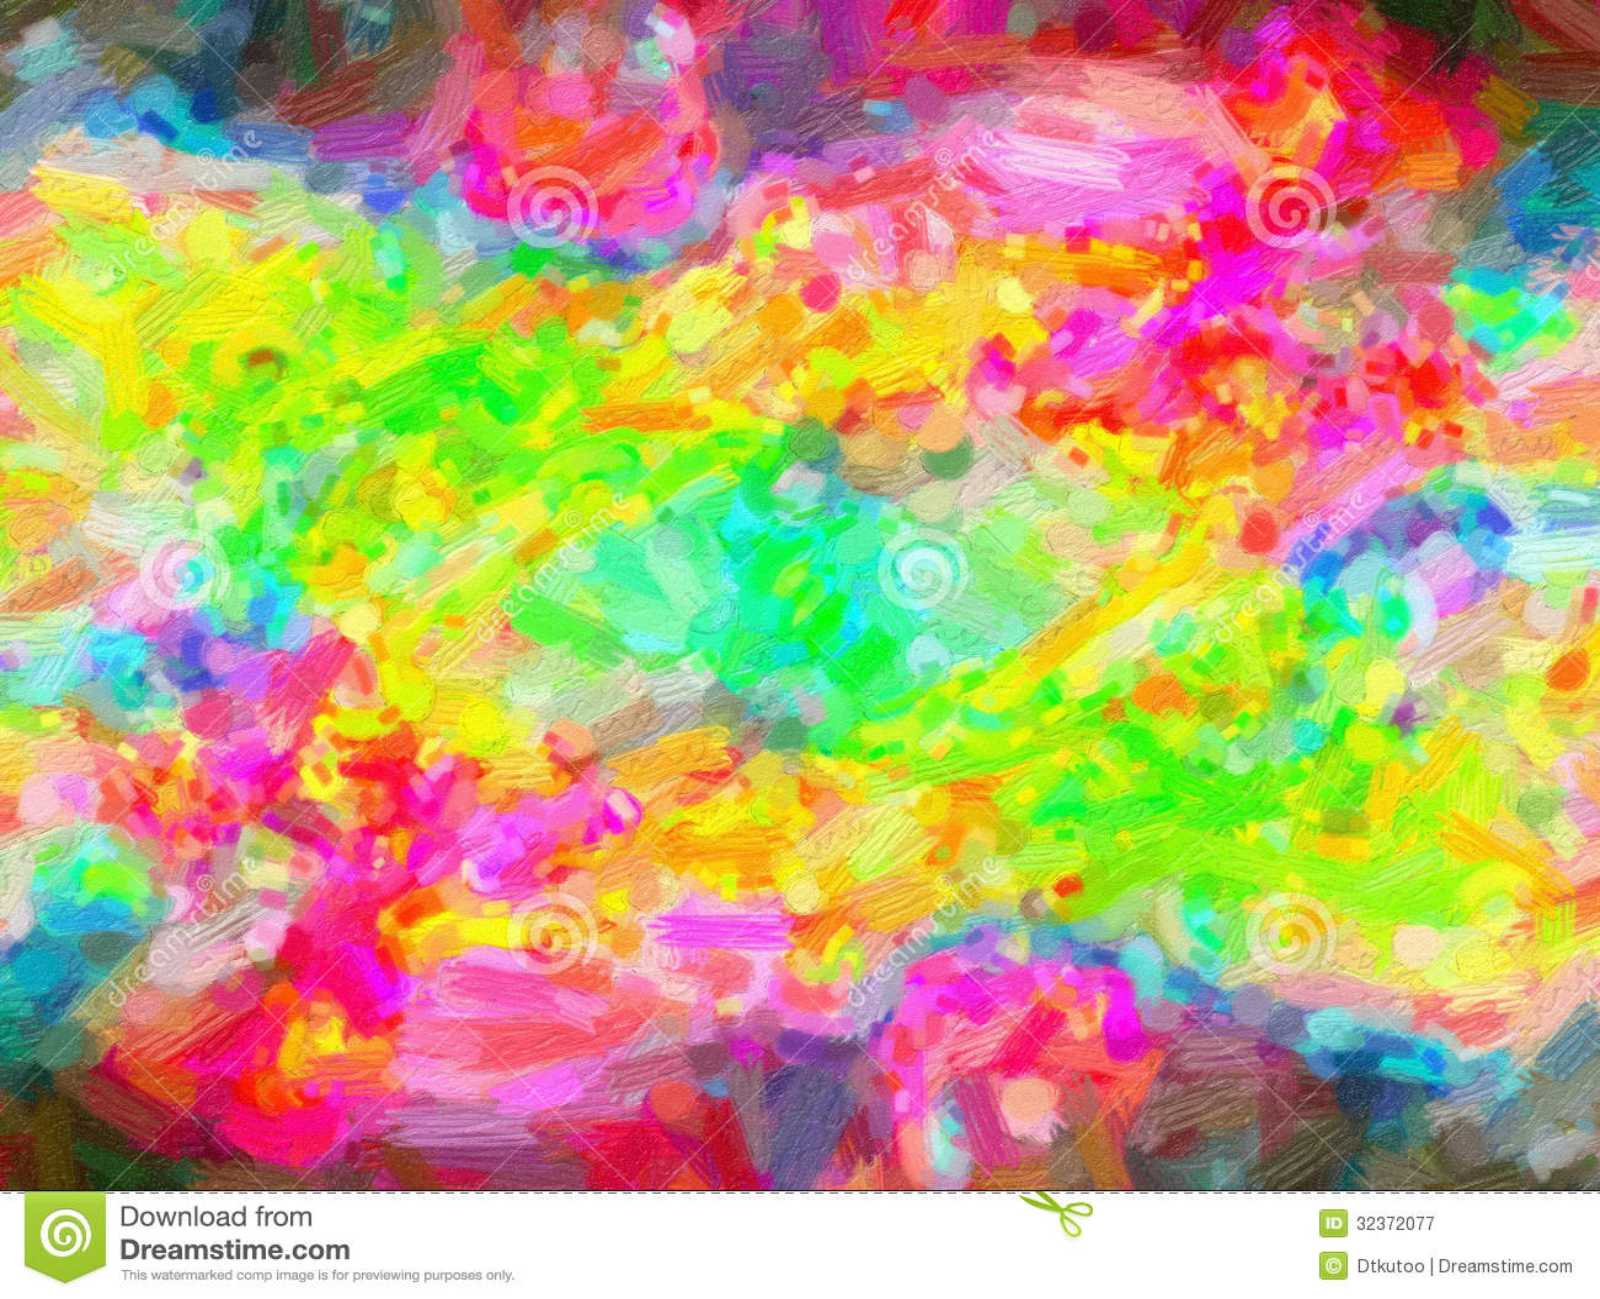 salpicadura de pintura fondo - photo #49